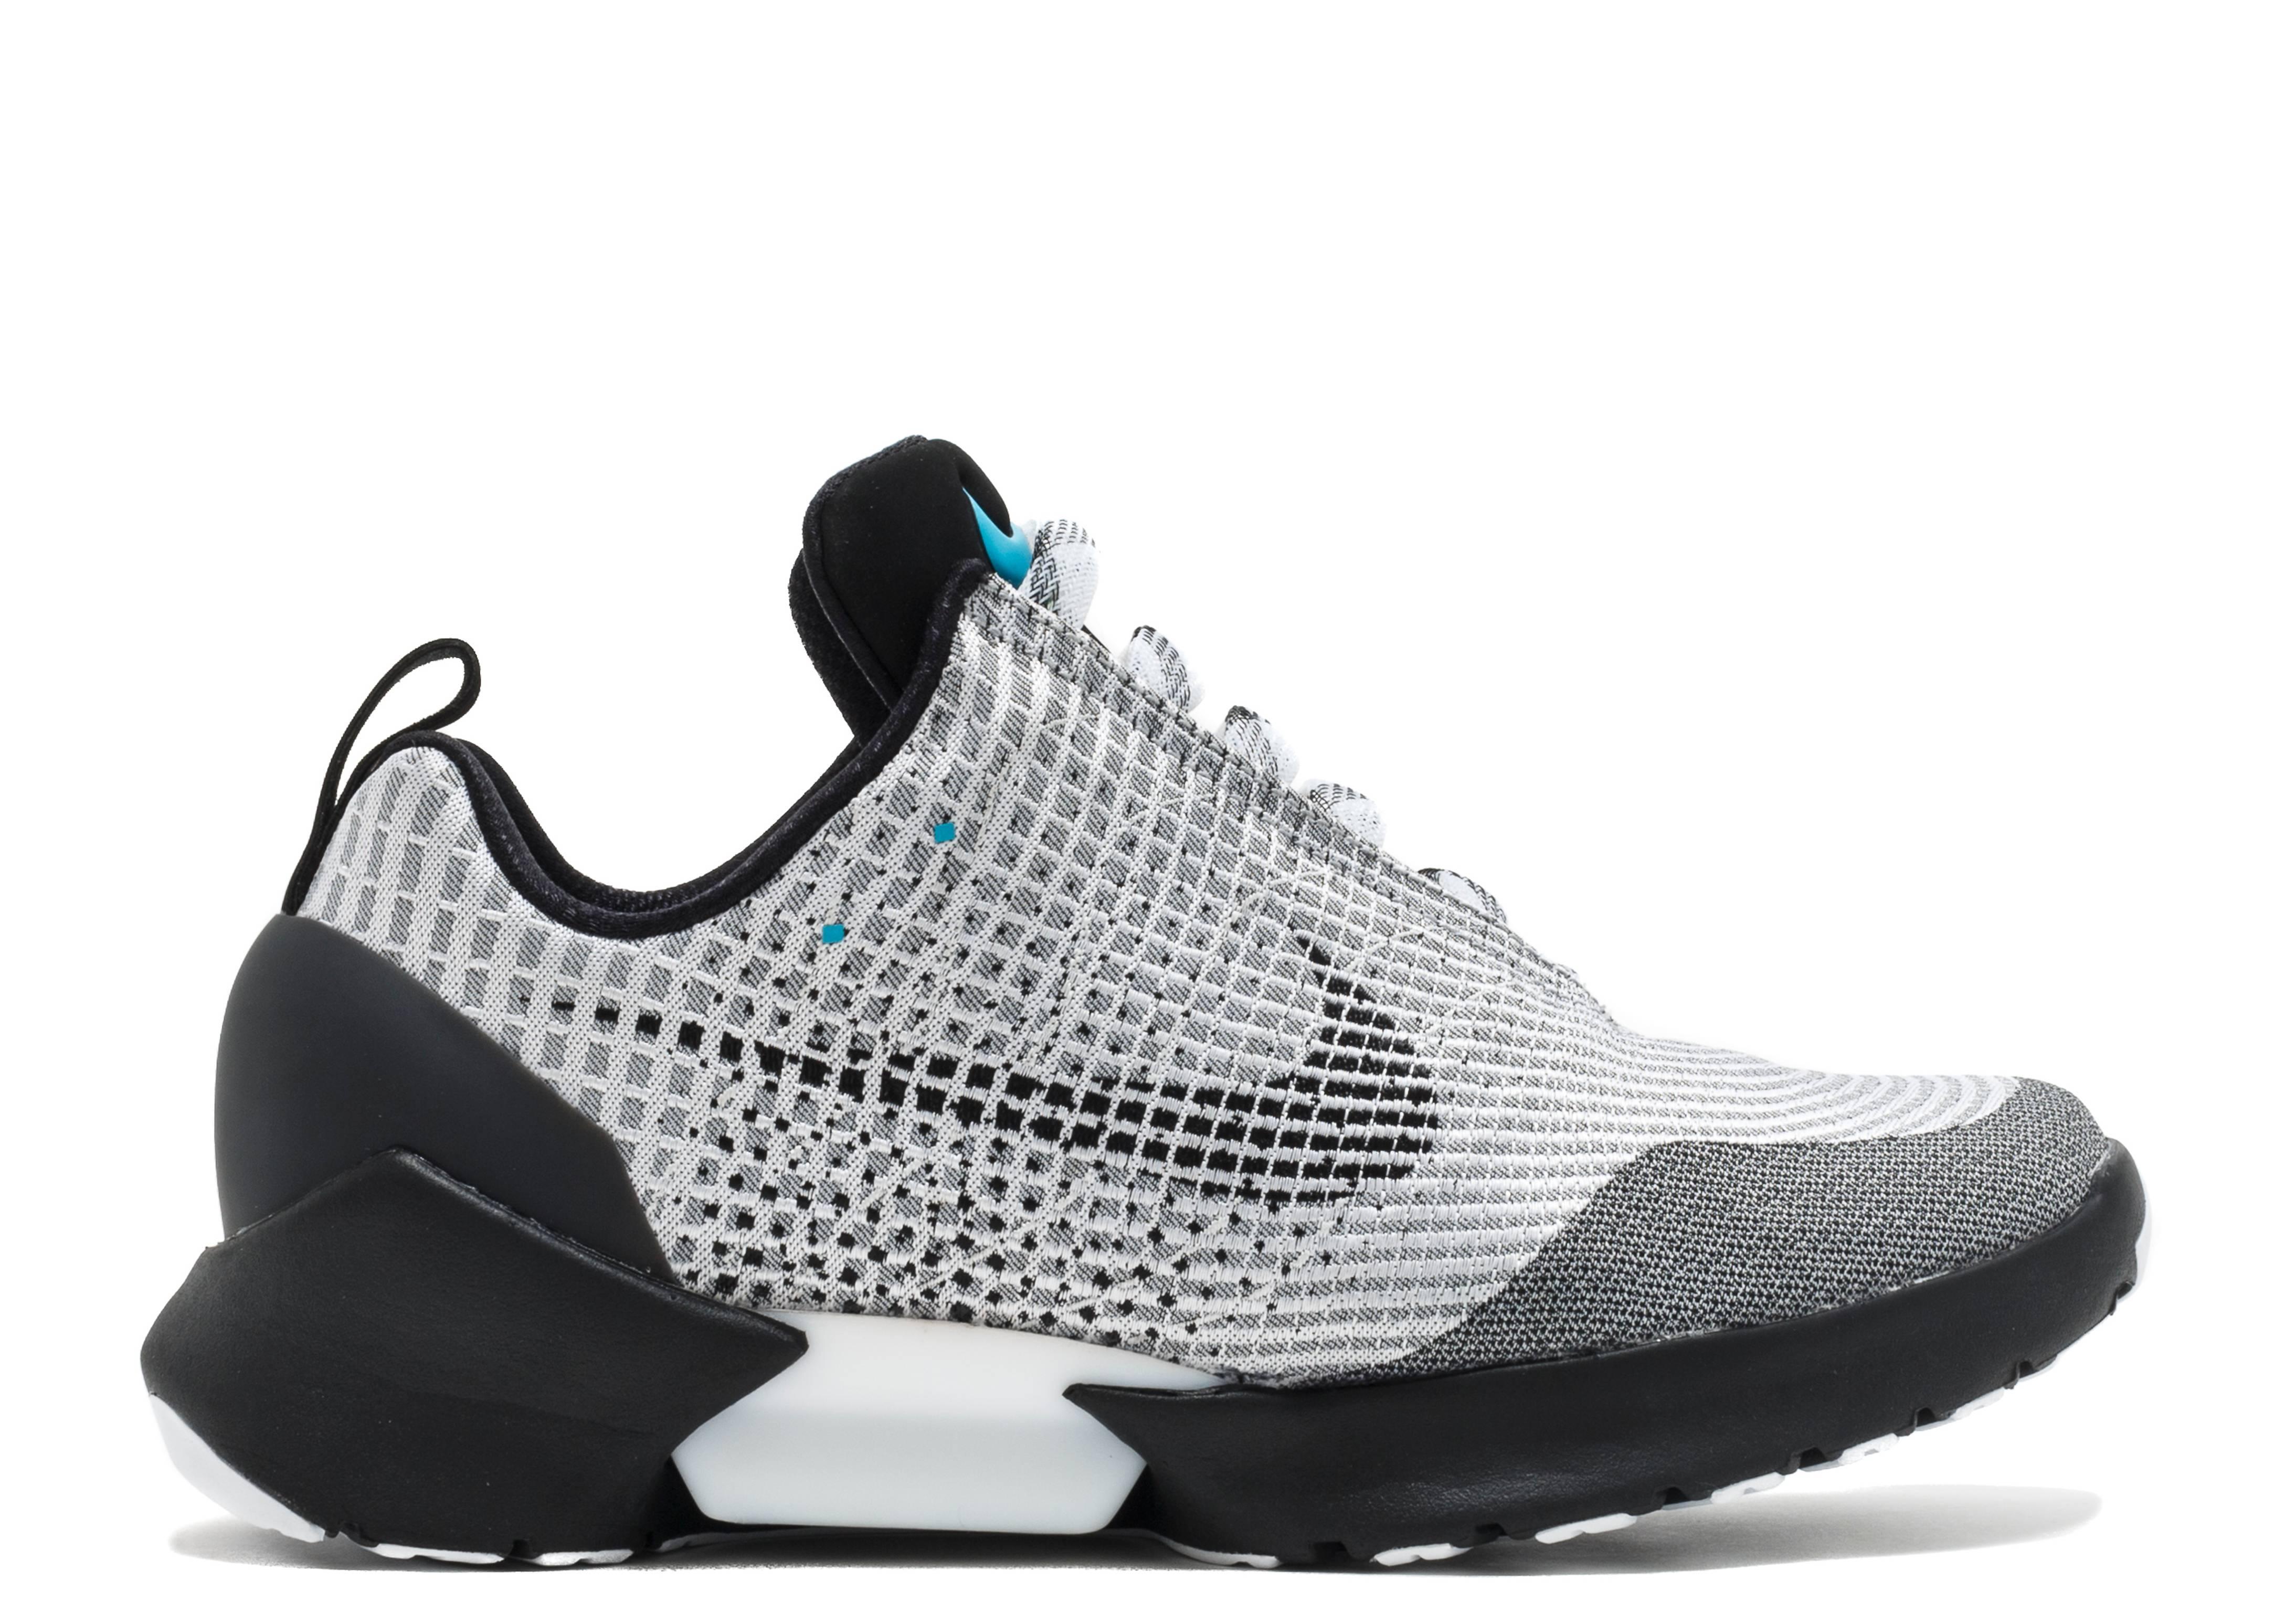 Nike Hyper Adapt 1.0 - Nike - 843871 002 - metallic silver black-white  6b53feafb